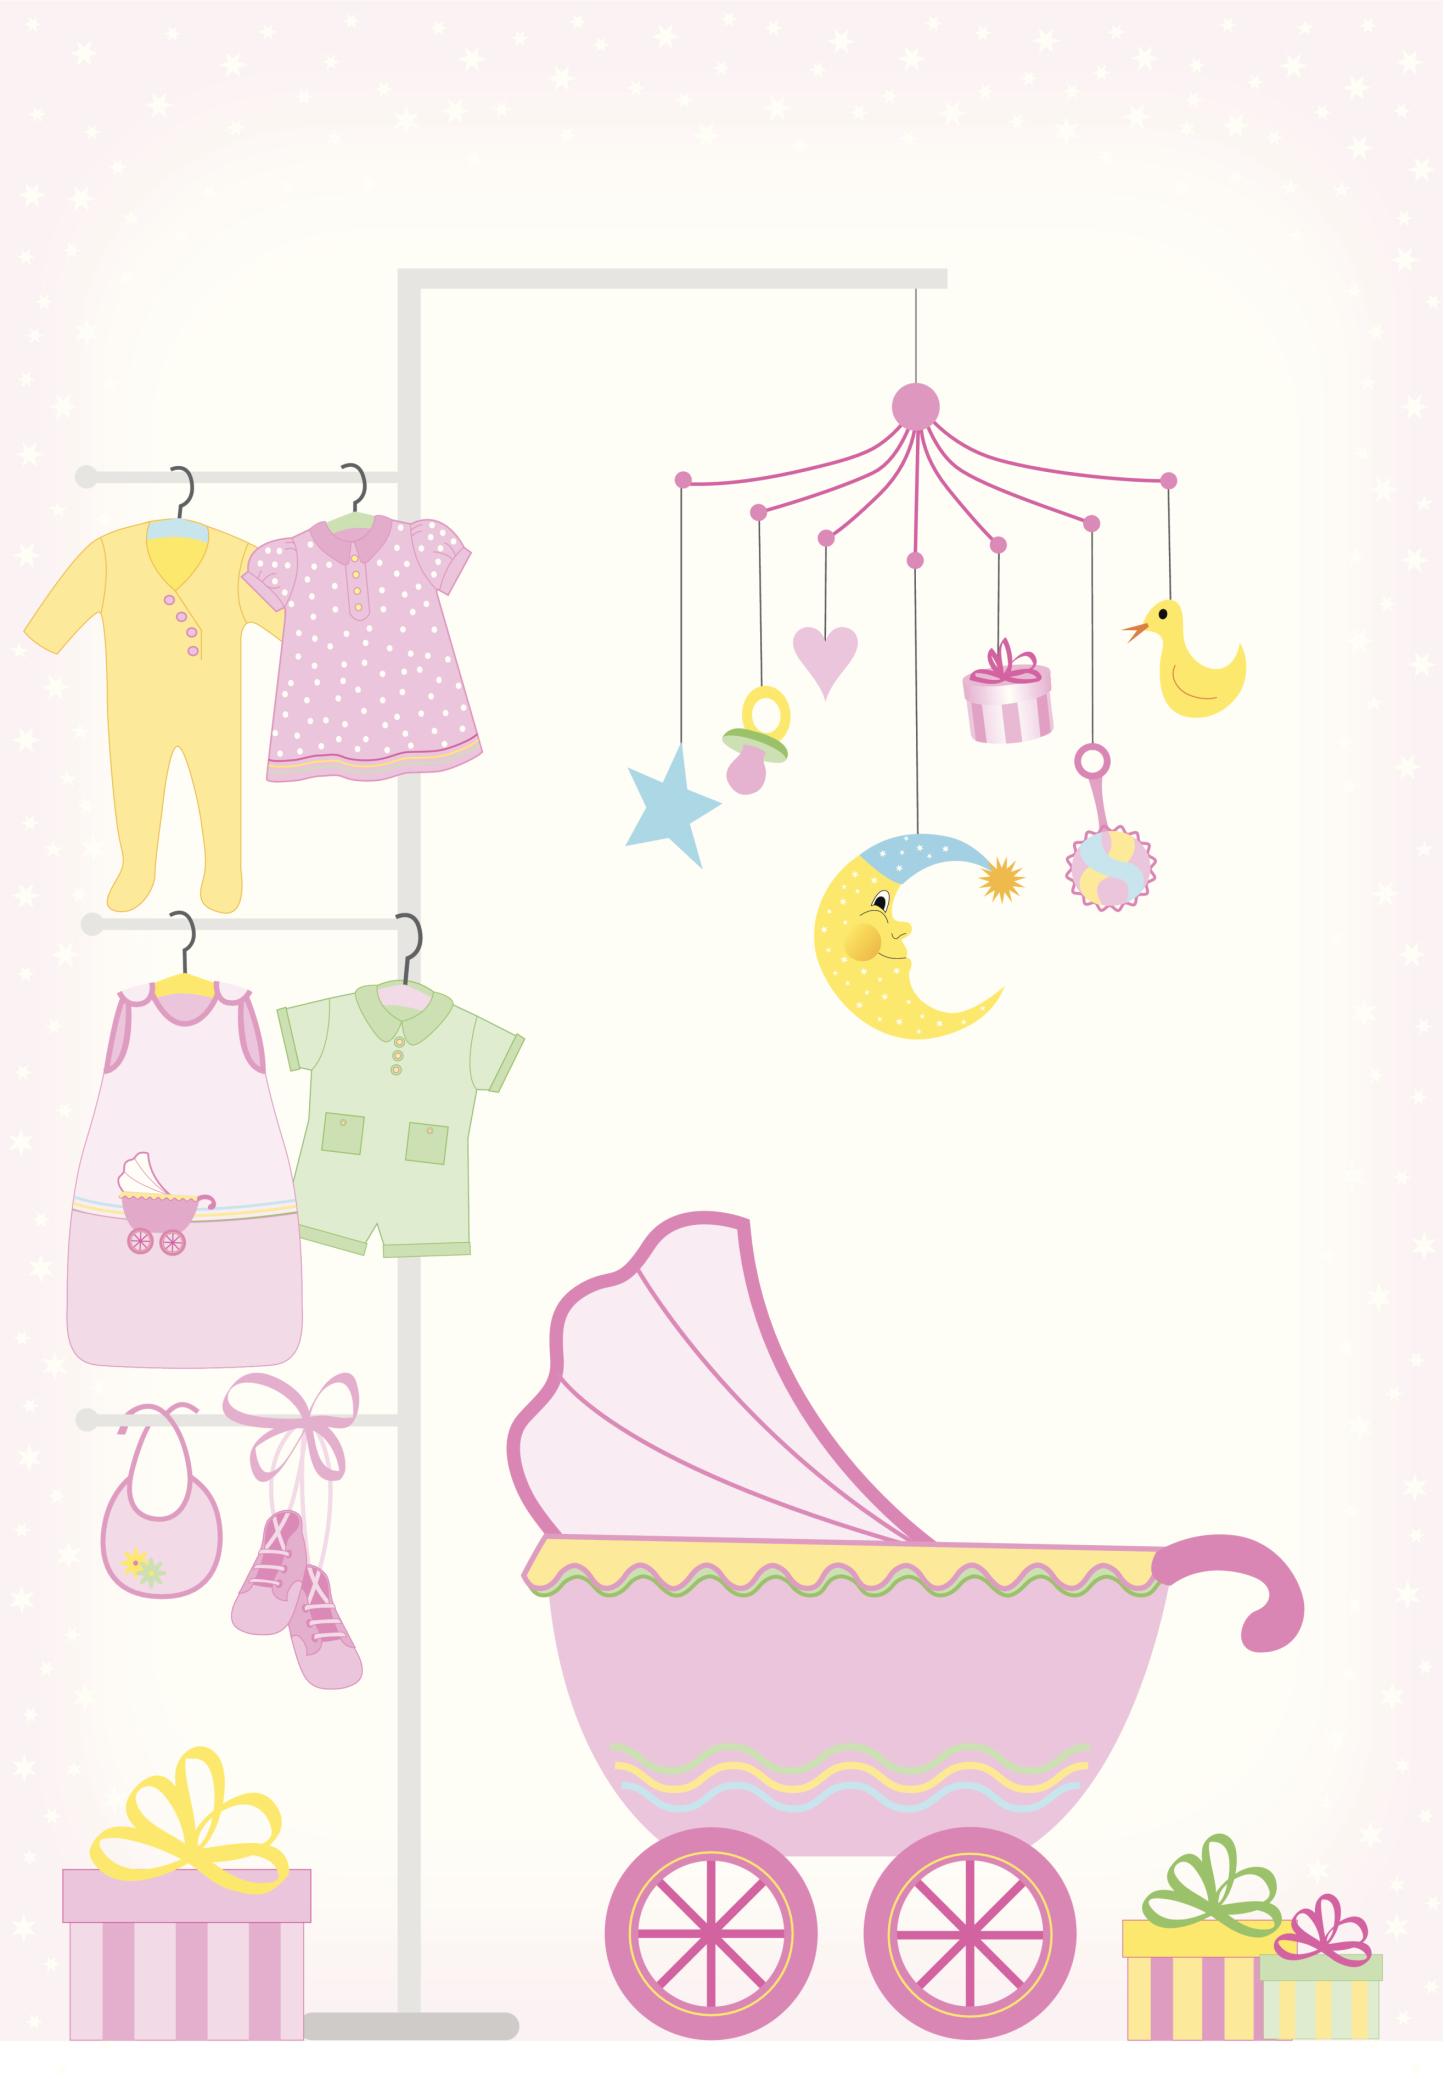 Baby Shower Imagenes.